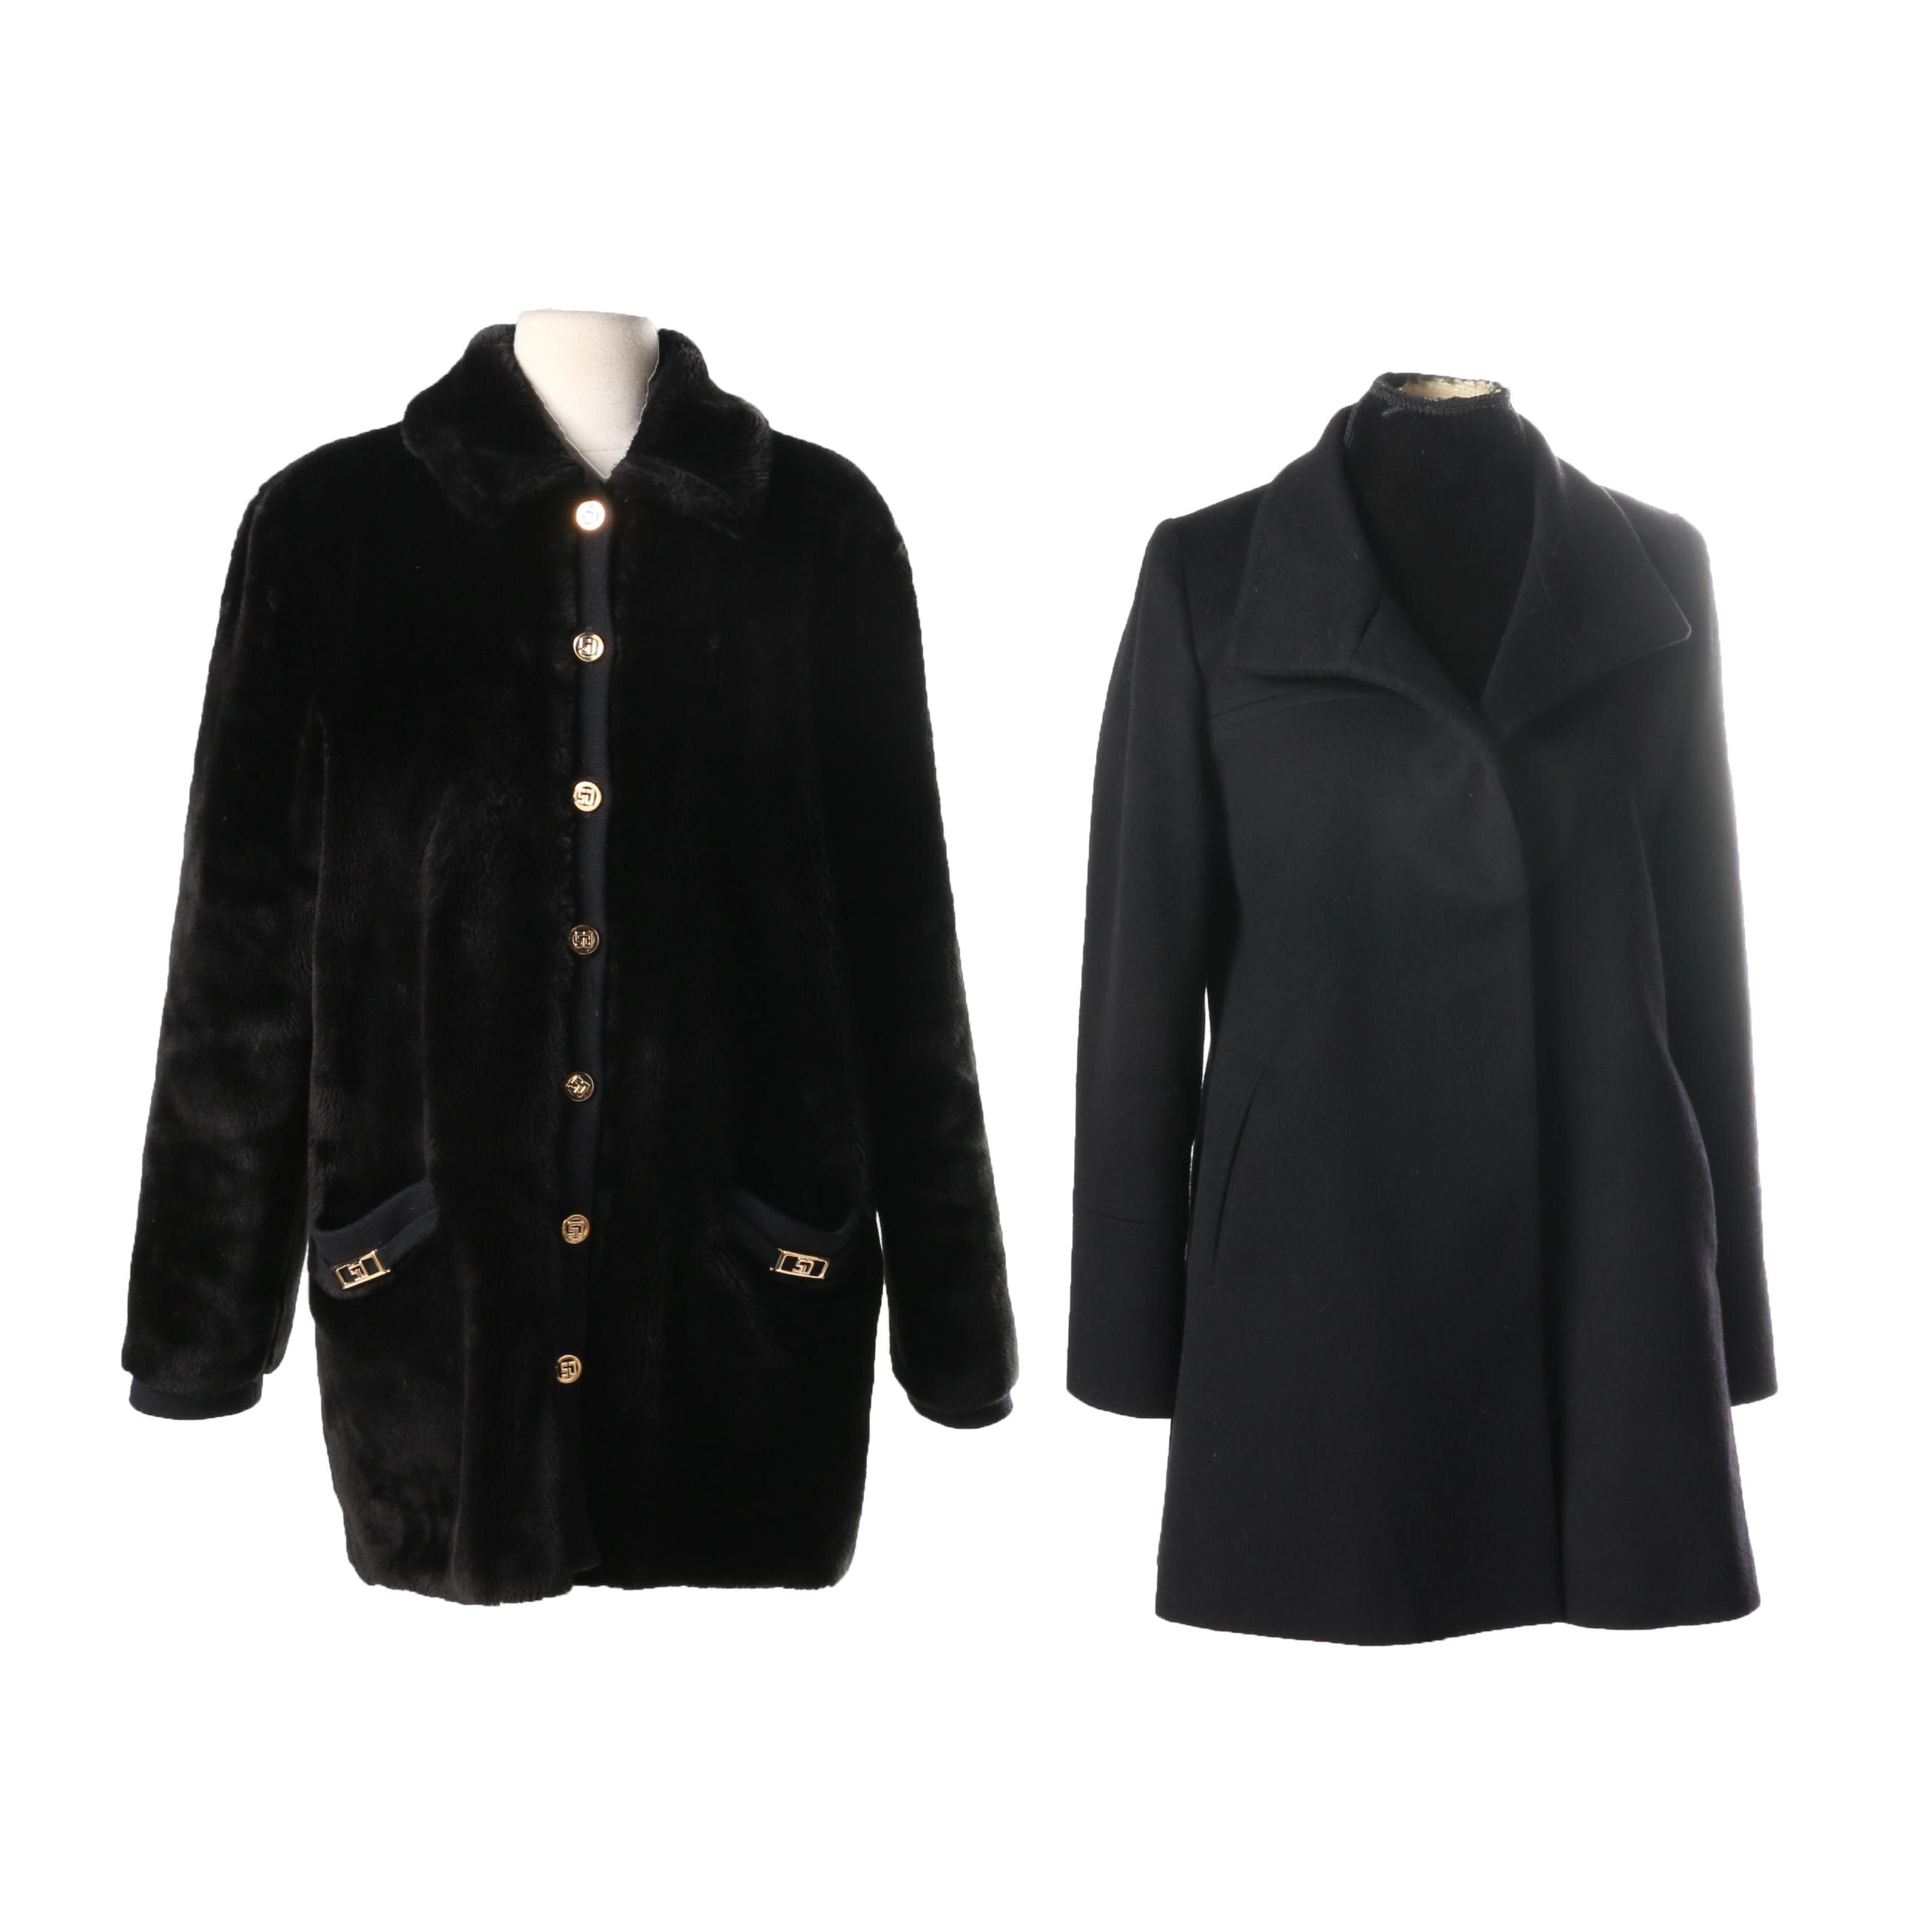 Women's Coats Including St. John and Fleurette